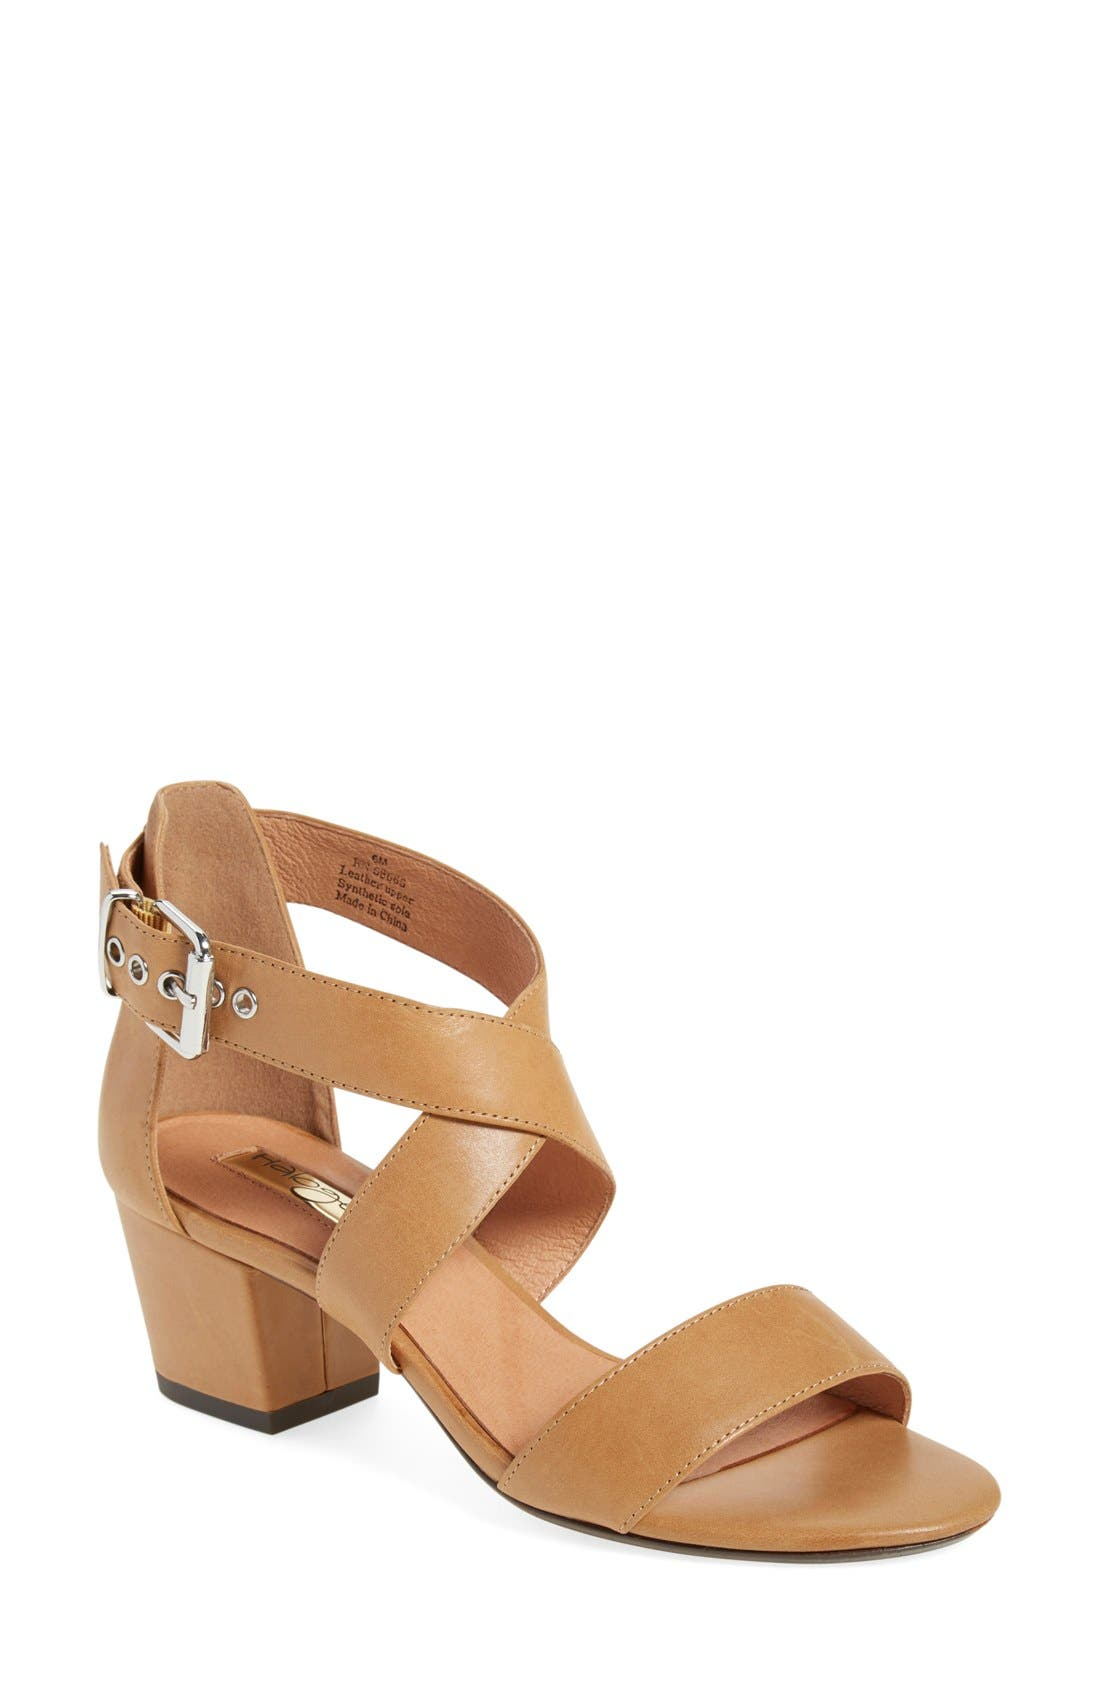 Halogen 'Rena' Crisscross Strap Sandal,                             Main thumbnail 1, color,                             Cognac